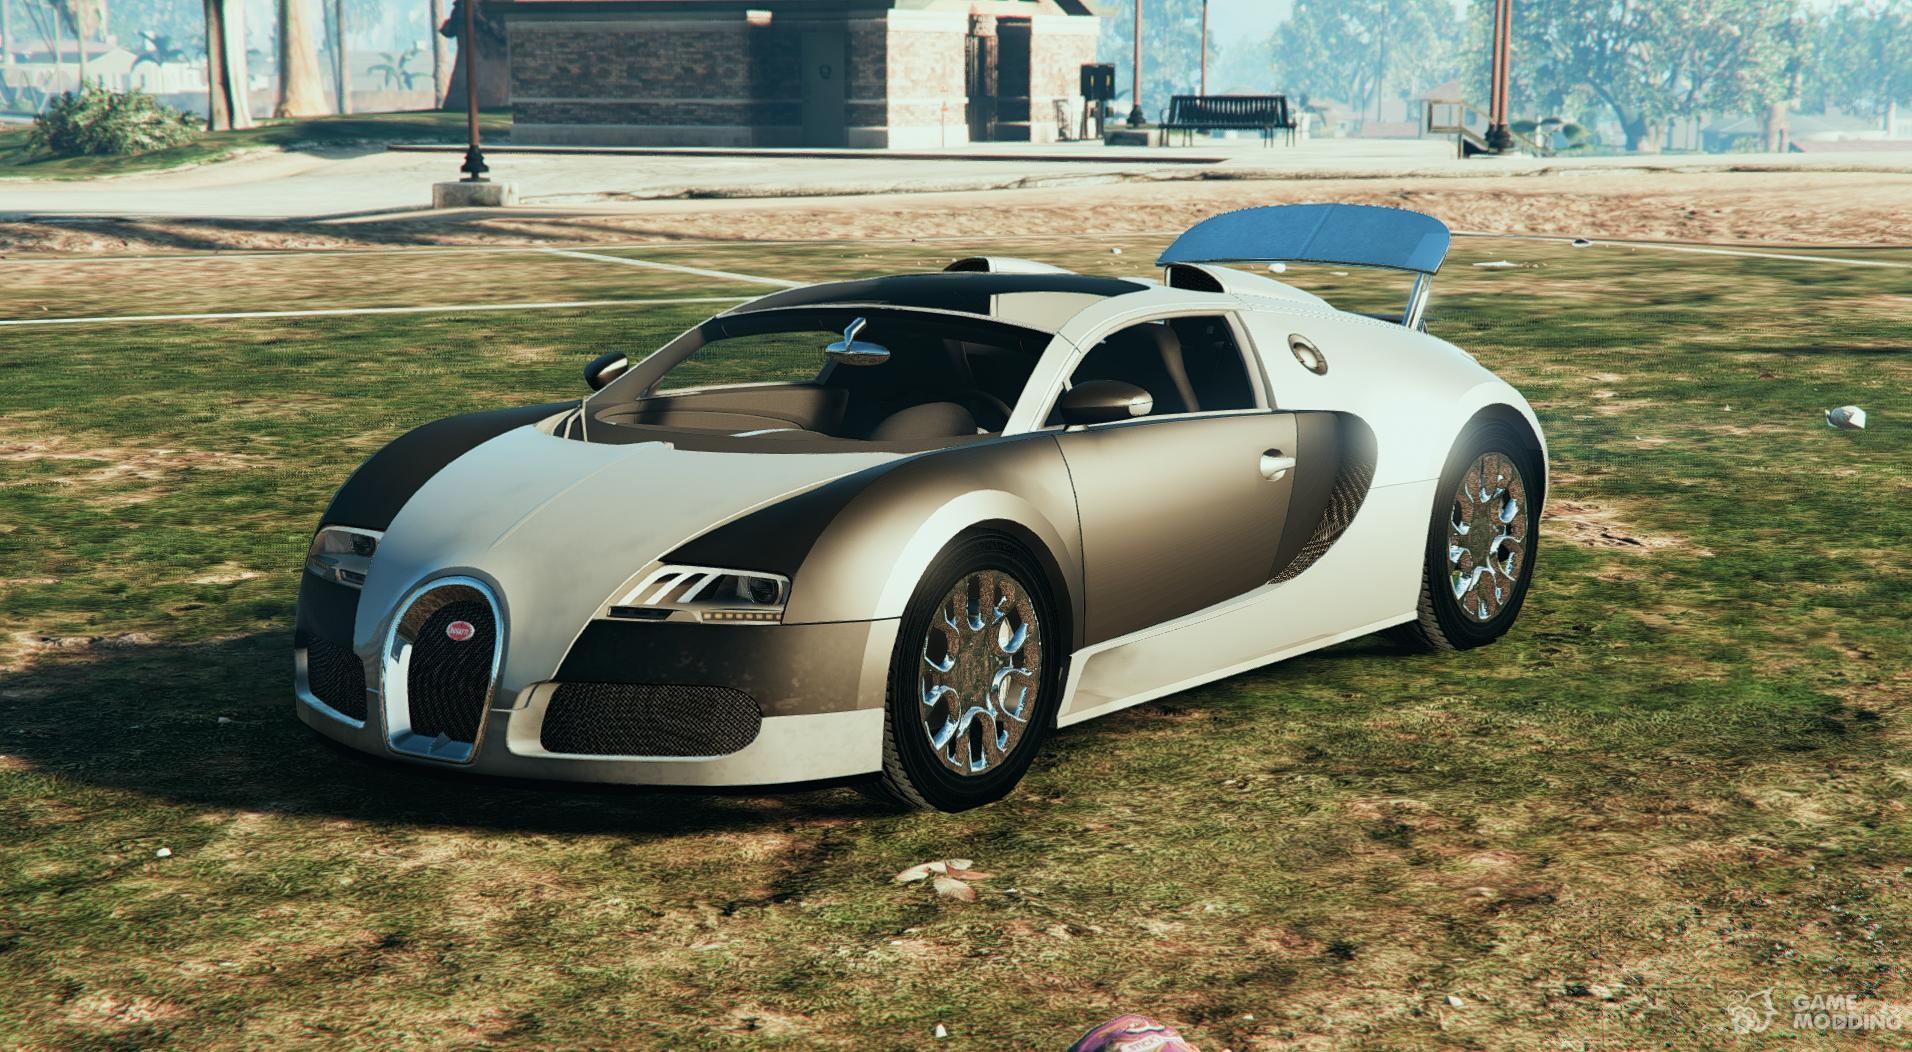 fbbb7c302ed77cbd20ac98ef2d1d8e22c280a1825842a2cc6432cdbf641c8faf Wonderful Bugatti Veyron Xbox 360 Games Cars Trend